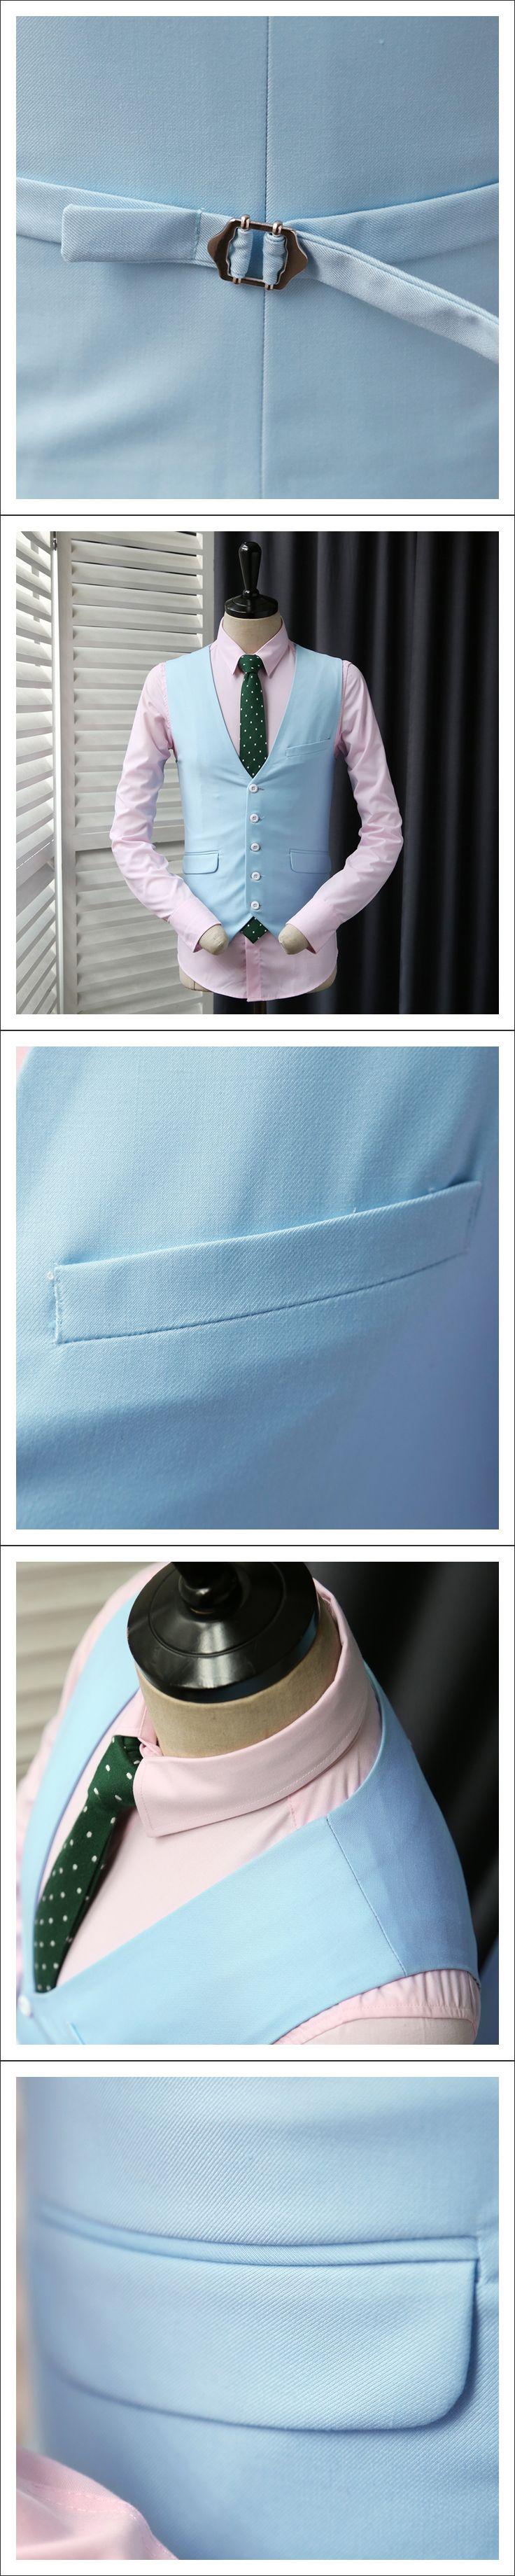 Suit Vest Men Jacket Sleeveless Sky Blue Vintage Tweed Vests Fashion Spring Autumn Plus Size Waistcoat Design